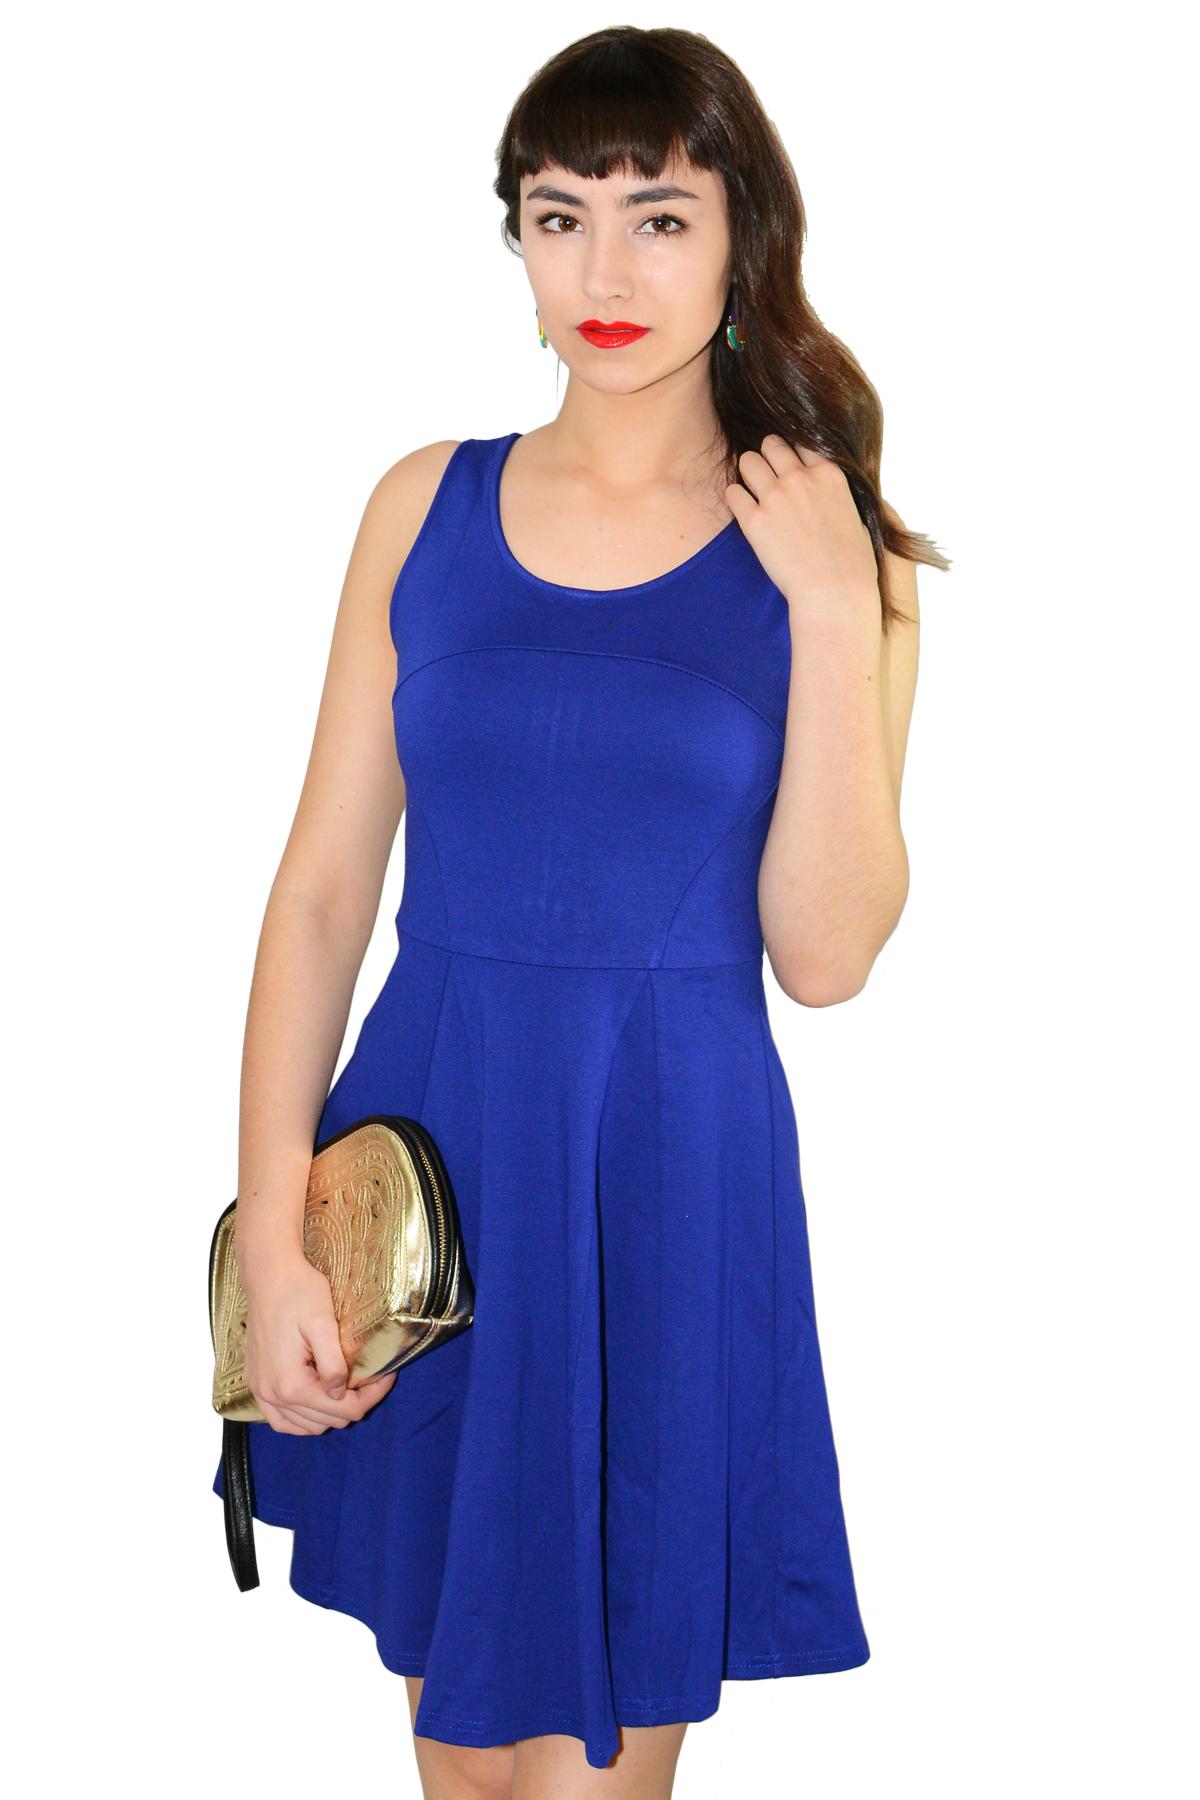 Royal blue dress — simply chic